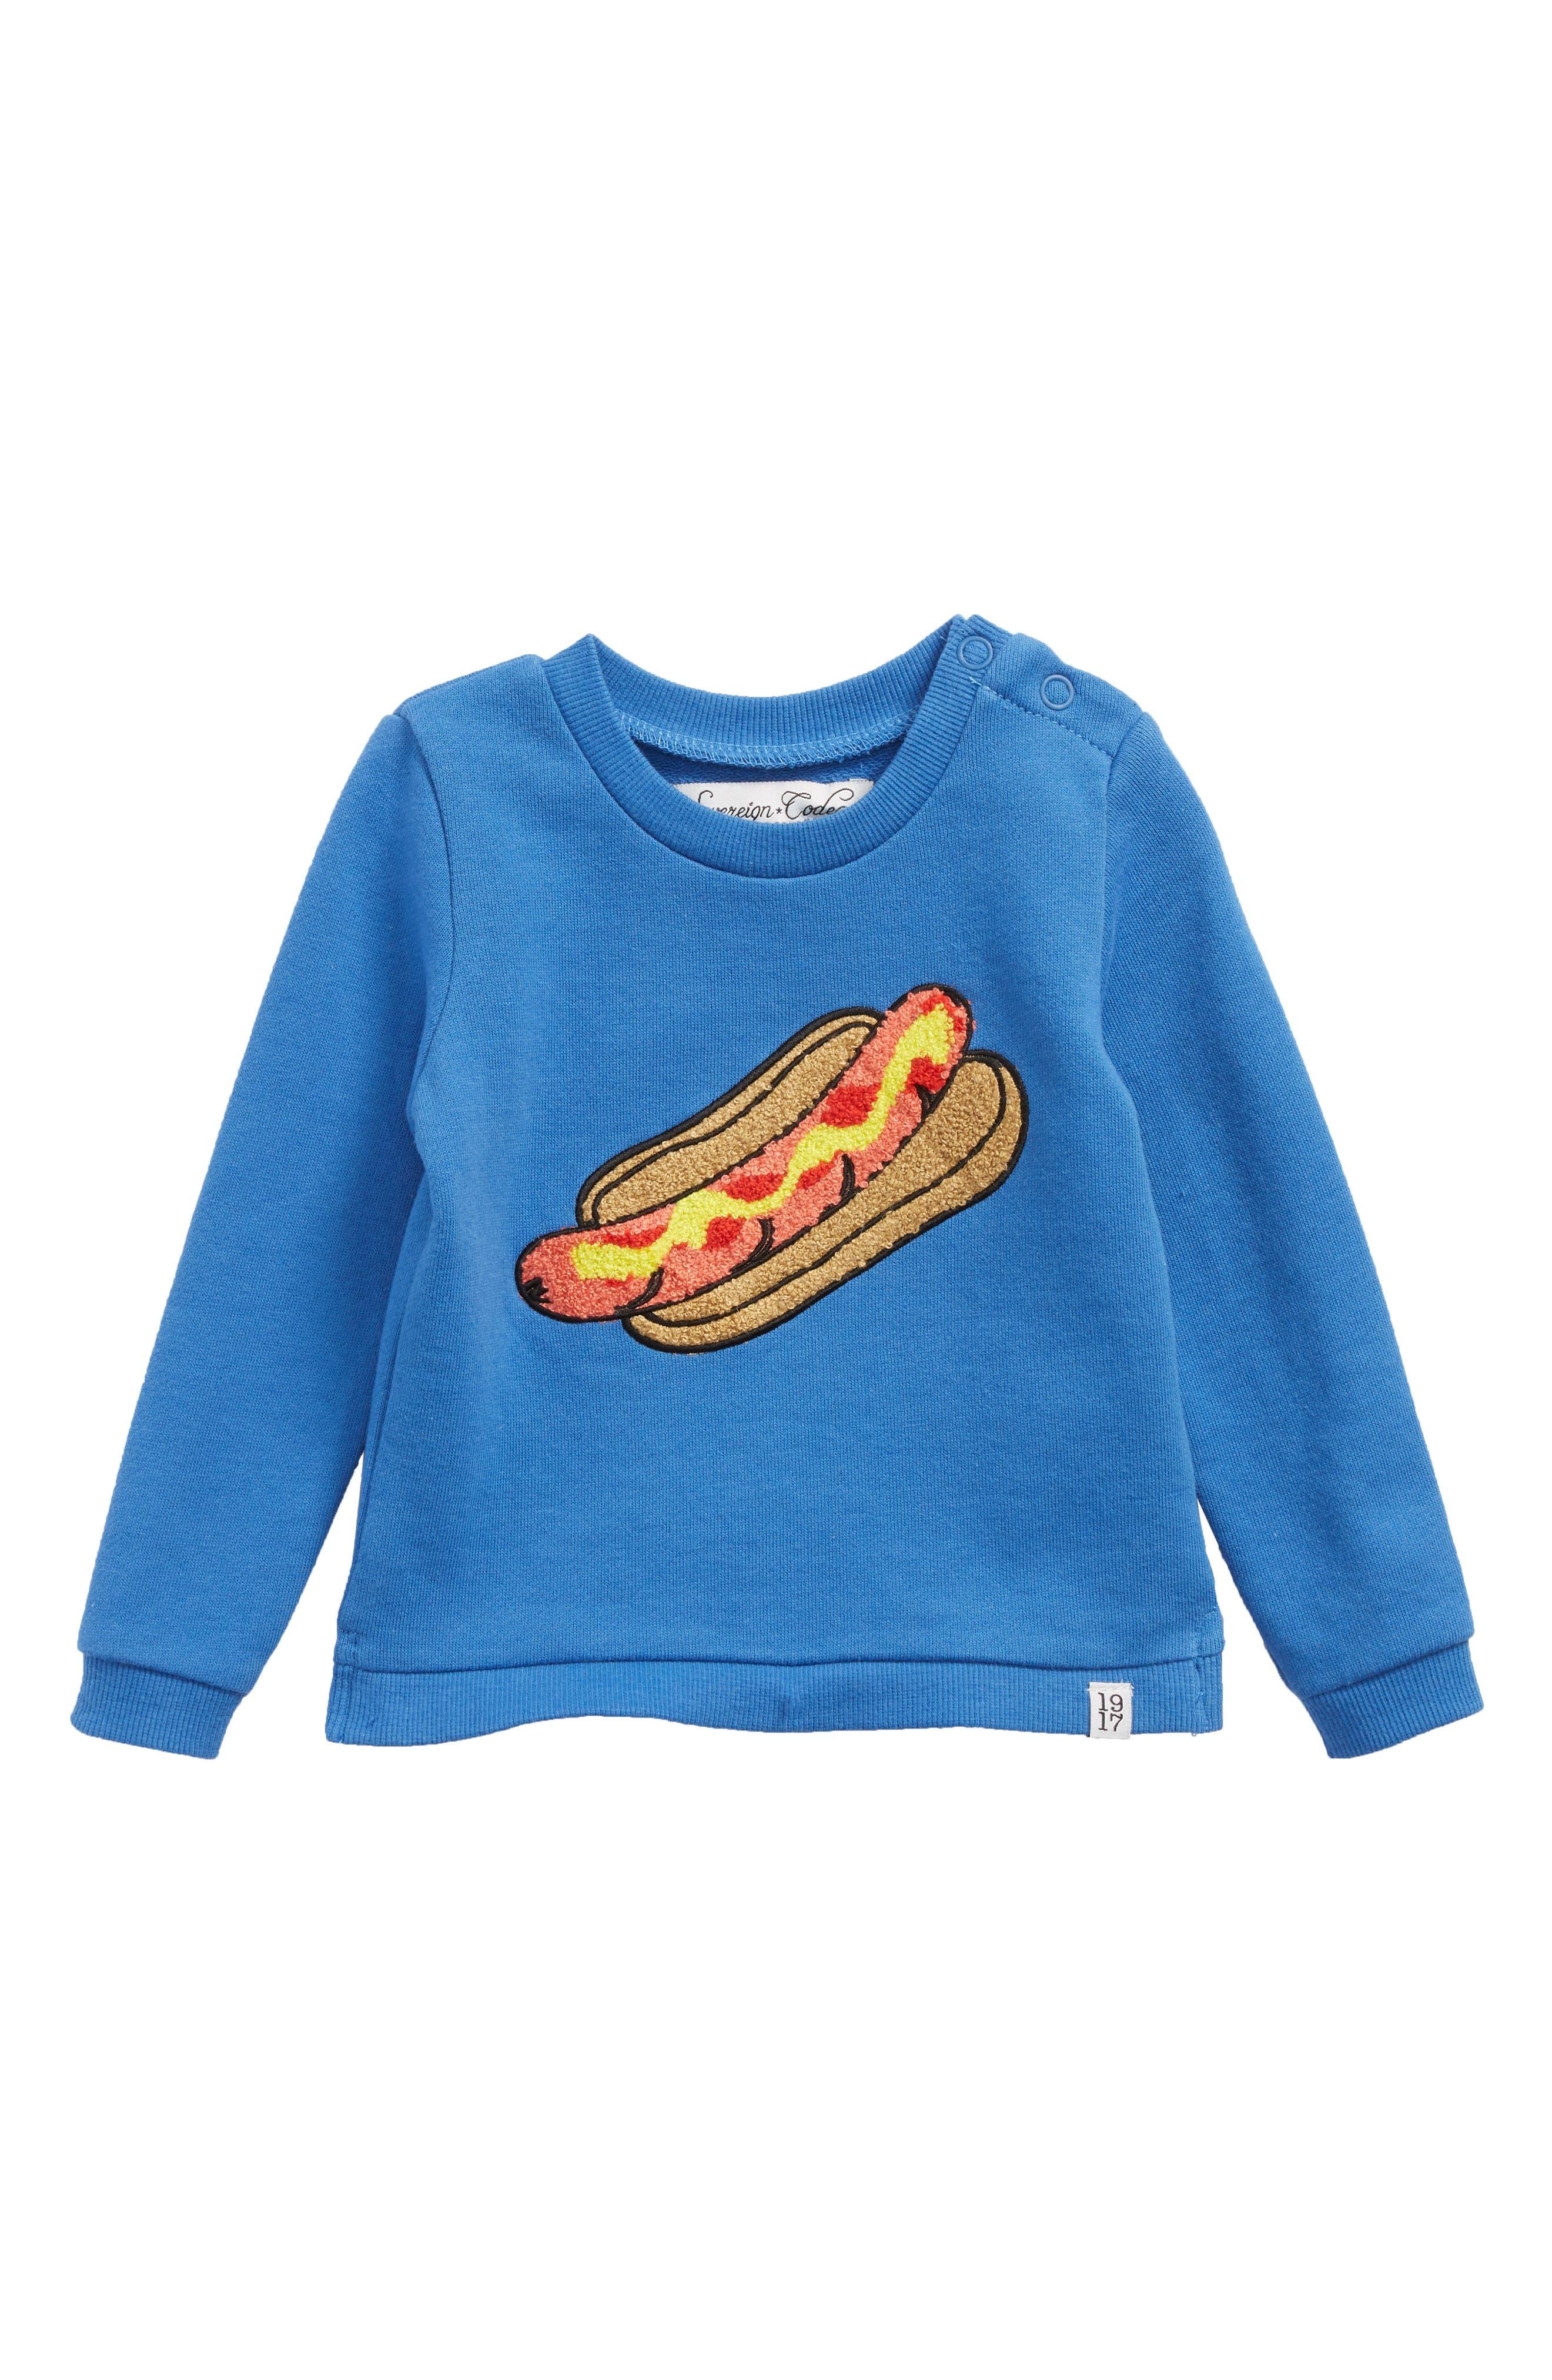 Sovereign Code Whoa Sweatshirt (Baby Boys)